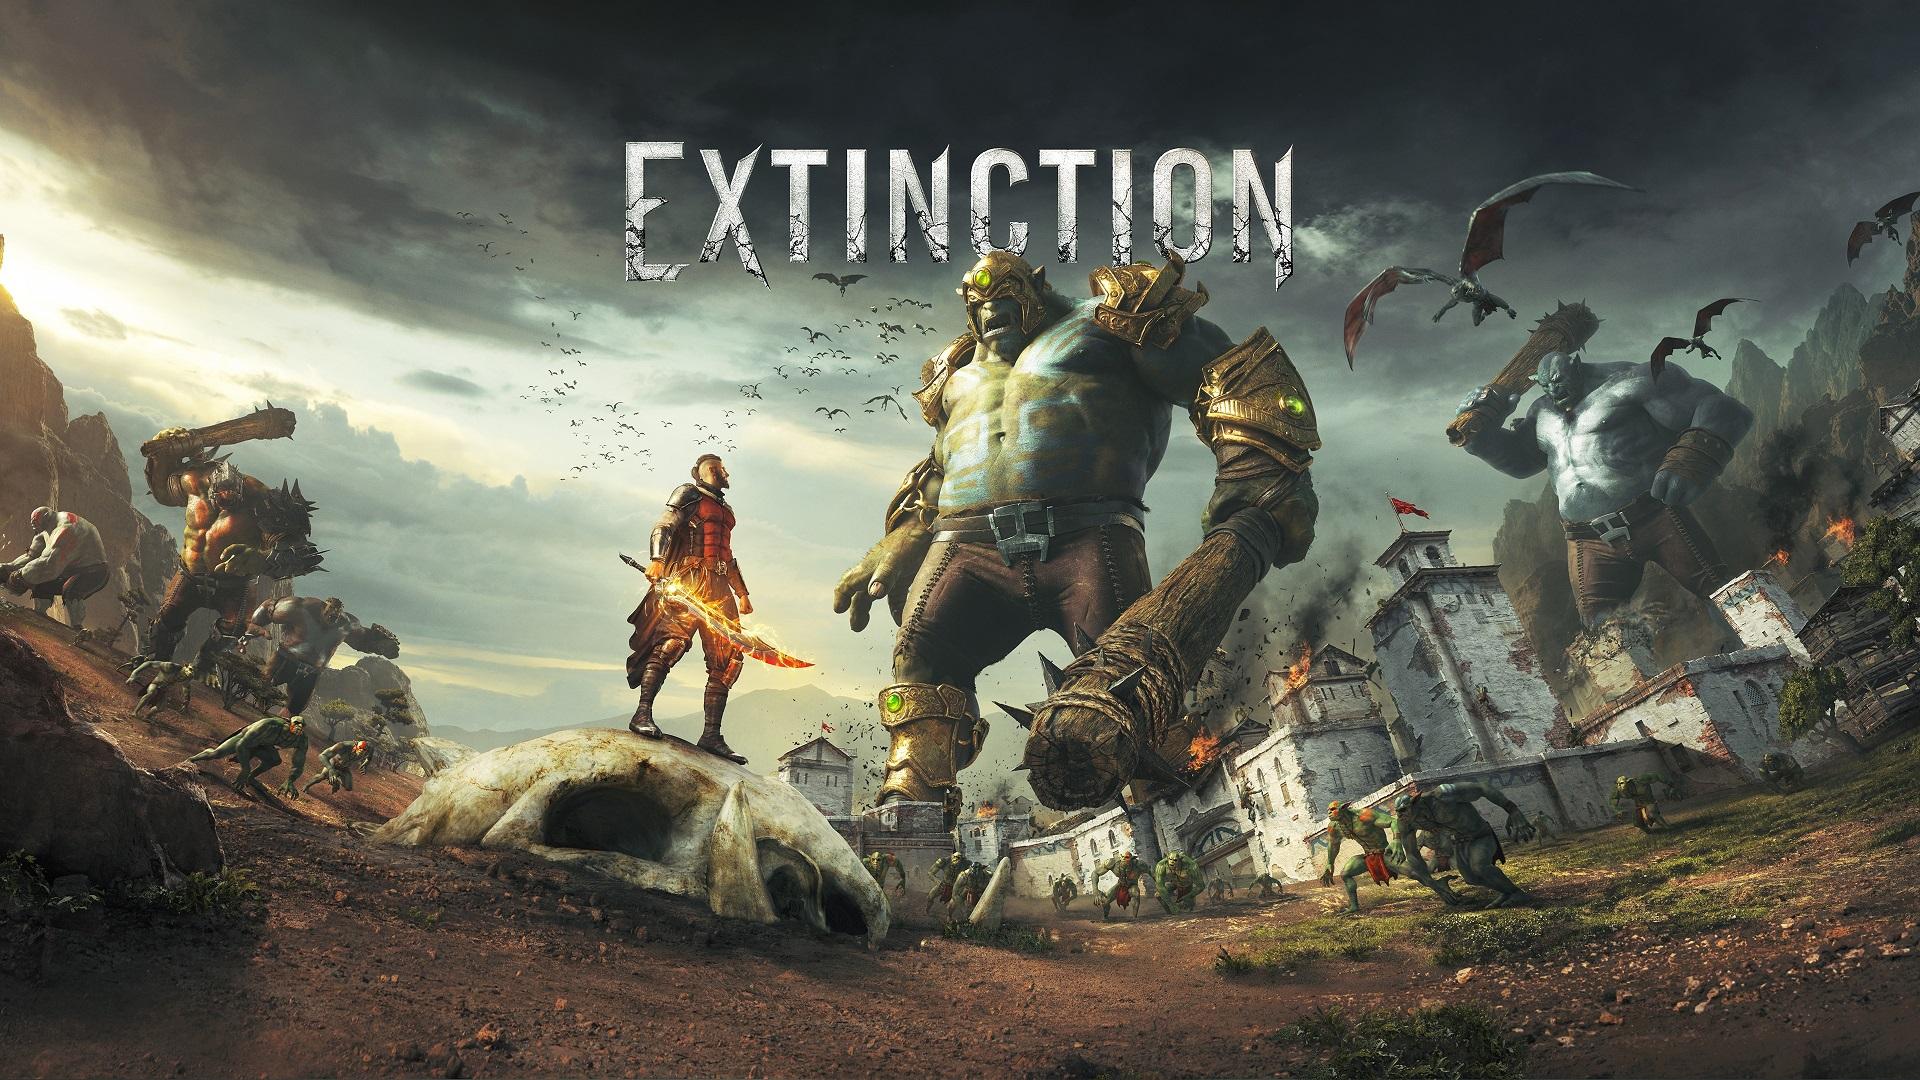 Extinction Game Xbox 360 Wallpaper ...